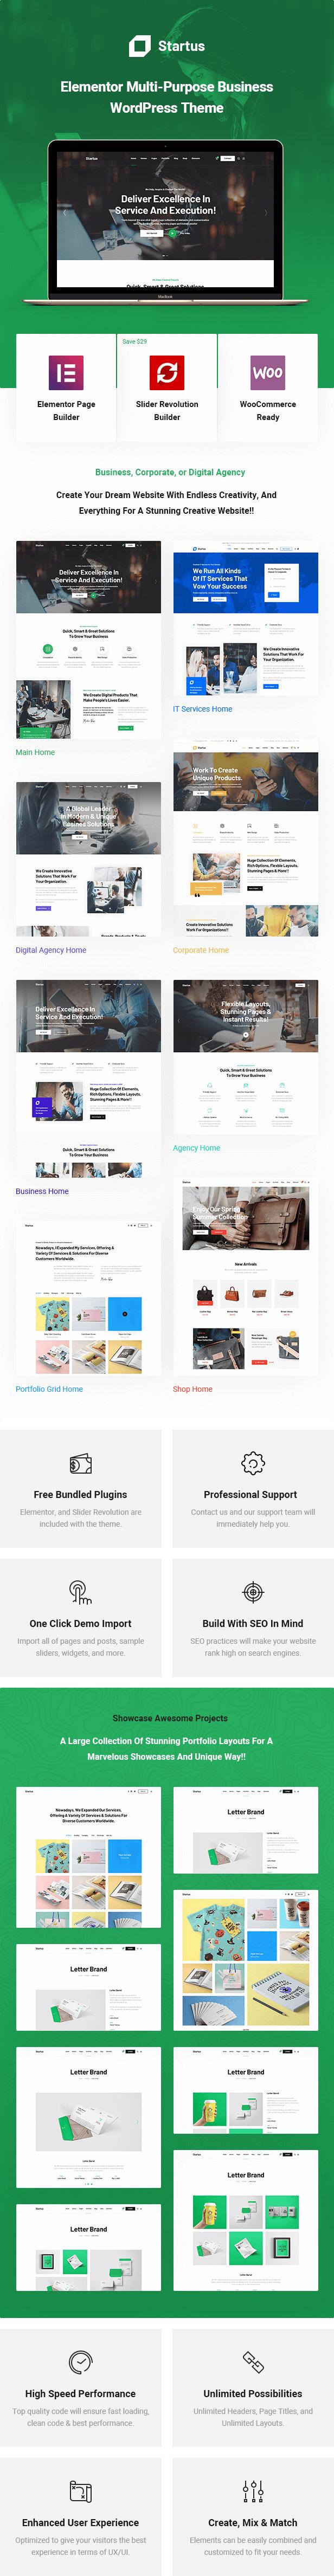 Startus - Multipurpose Business WordPress Theme - 1